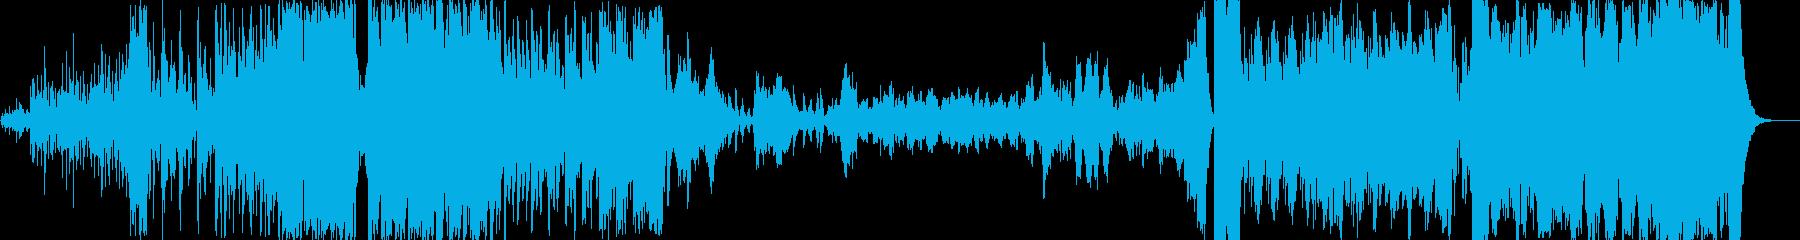 EPIC Music ファンタジーの世界の再生済みの波形